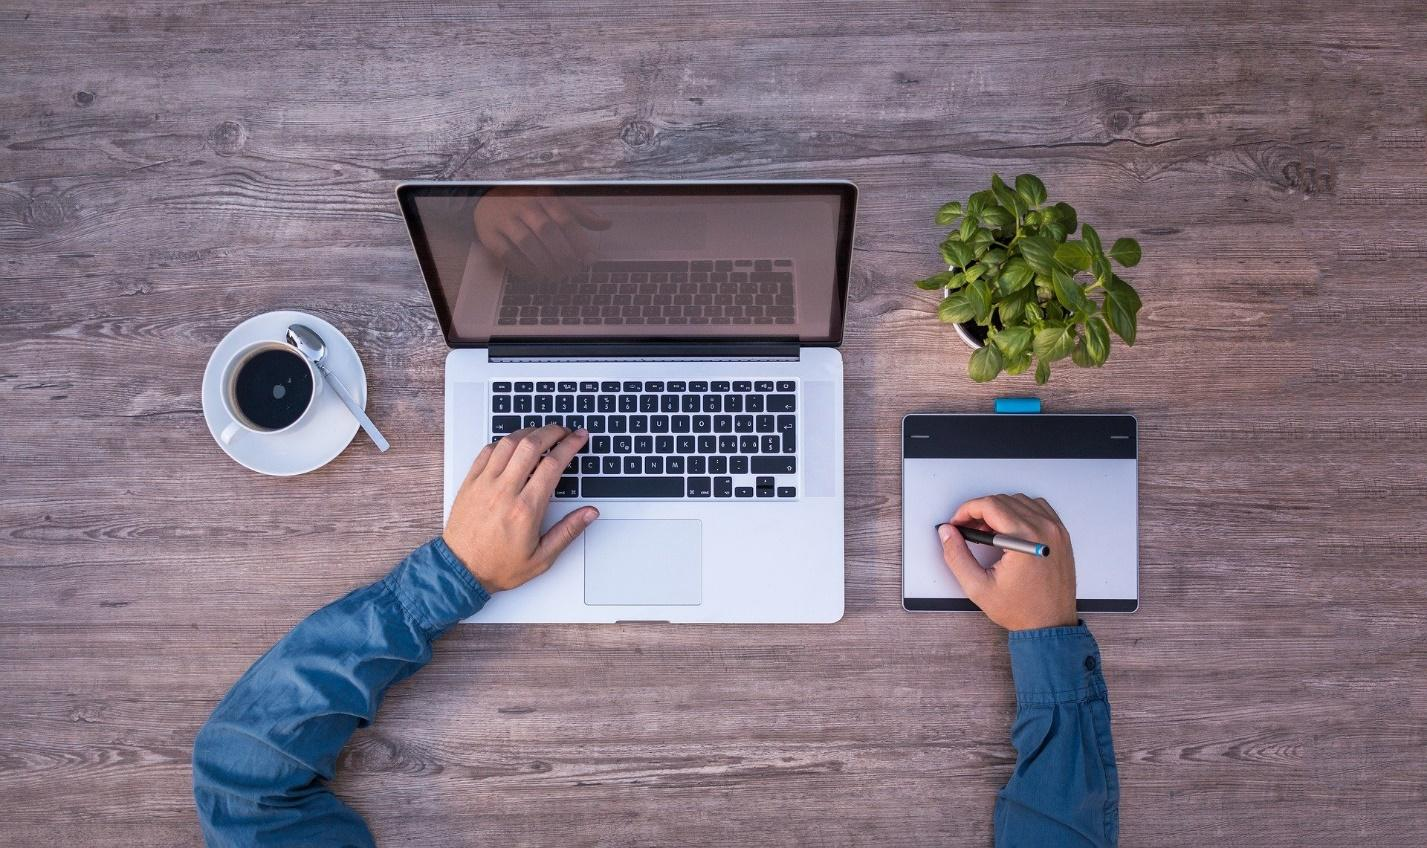 How Web Design Affects Consumer Behavior